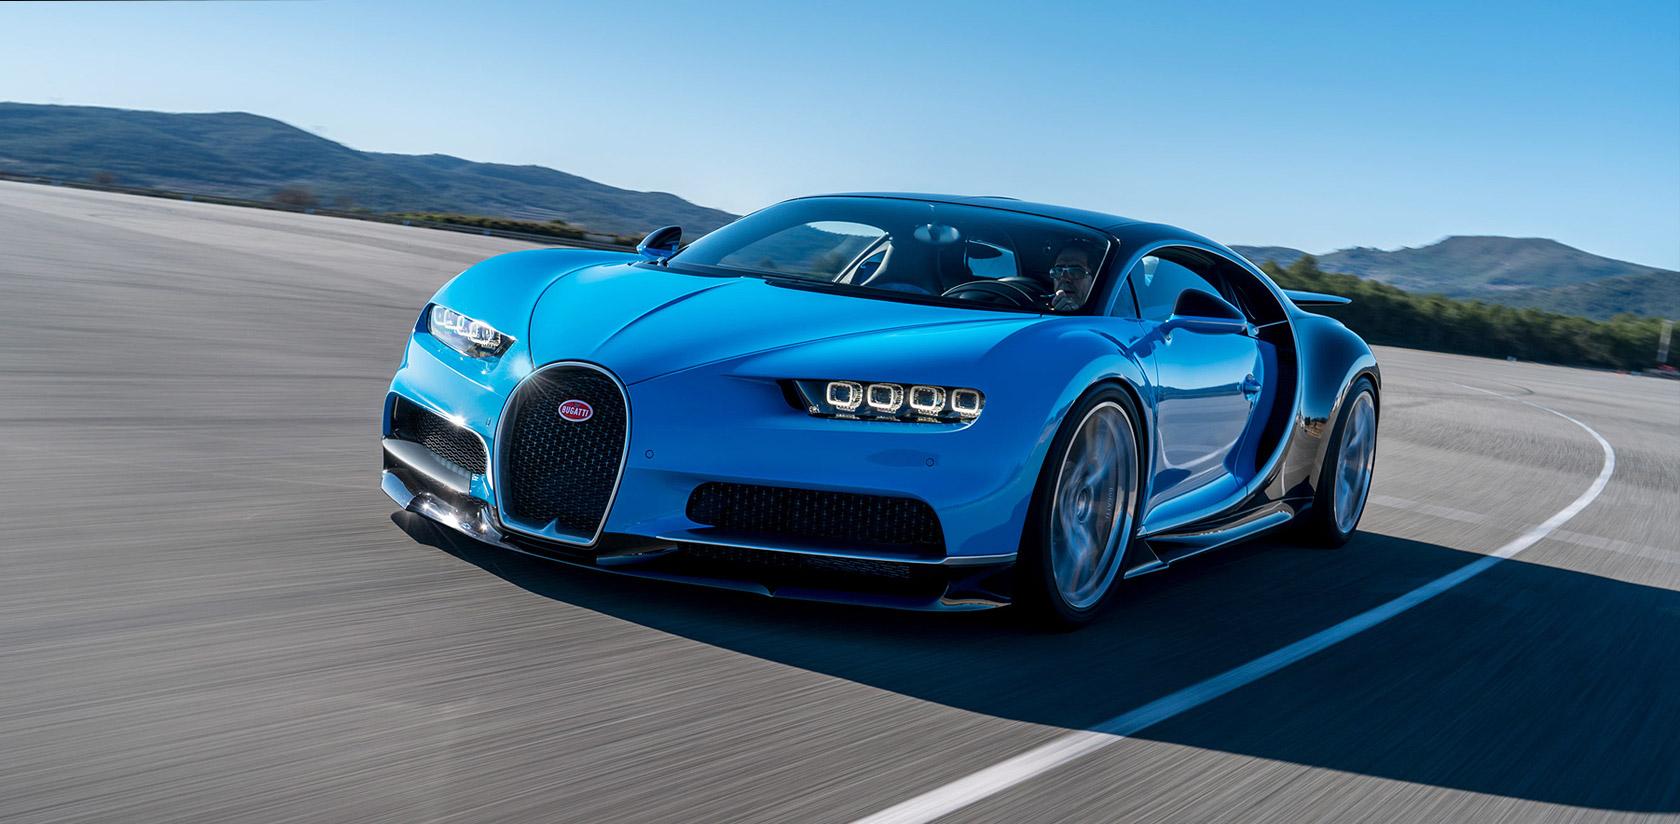 High Resolution Wallpaper | Bugatti 1680x824 px